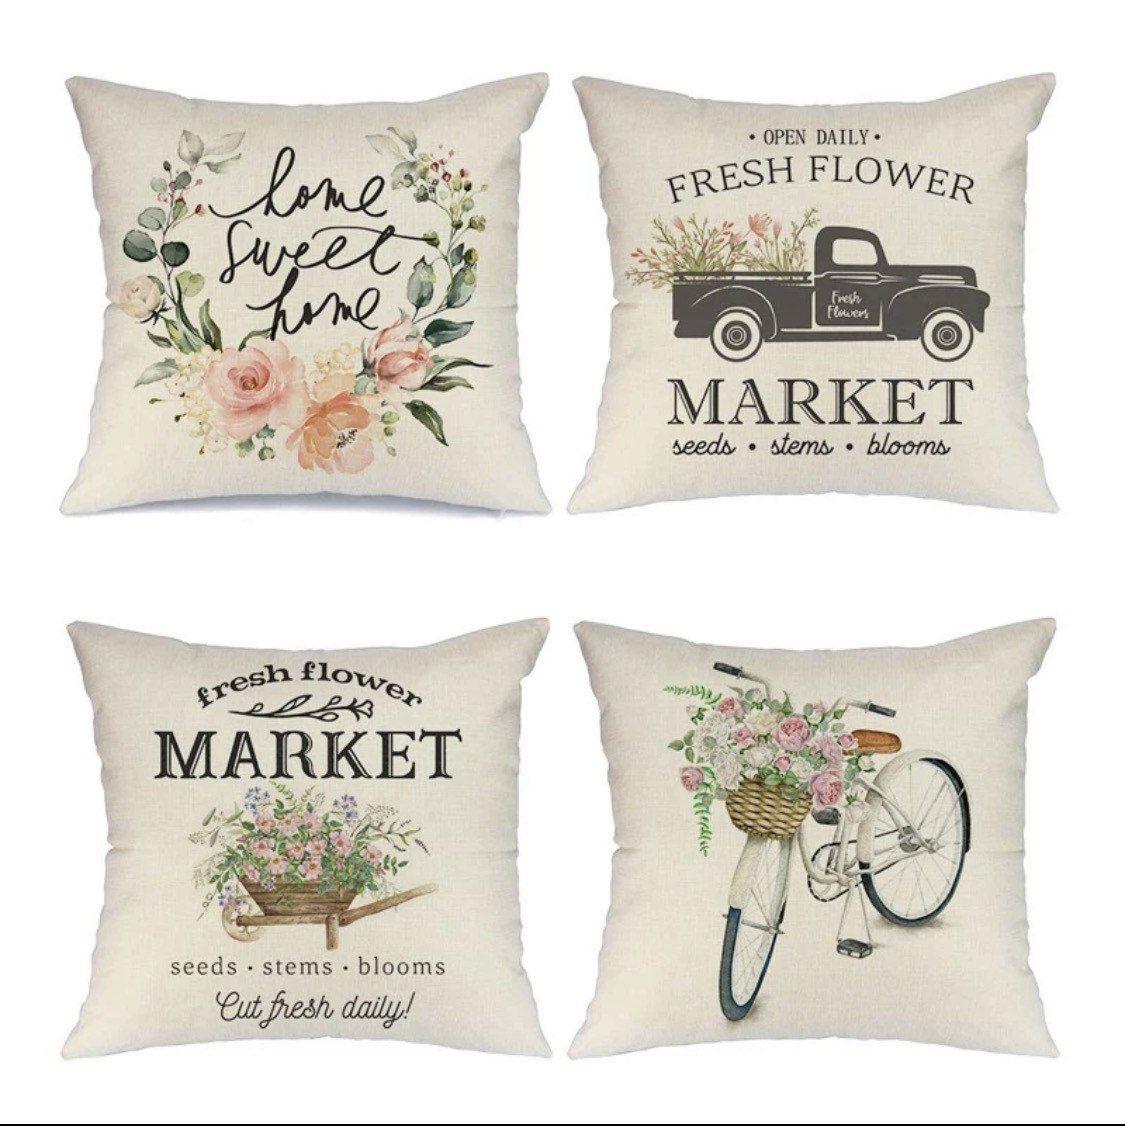 Spring Throw Pillow Covers 18x18in Flower Market Decor Set 4 Etsy Spring Throw Pillows Farmhouse Throw Pillow Spring Pillows